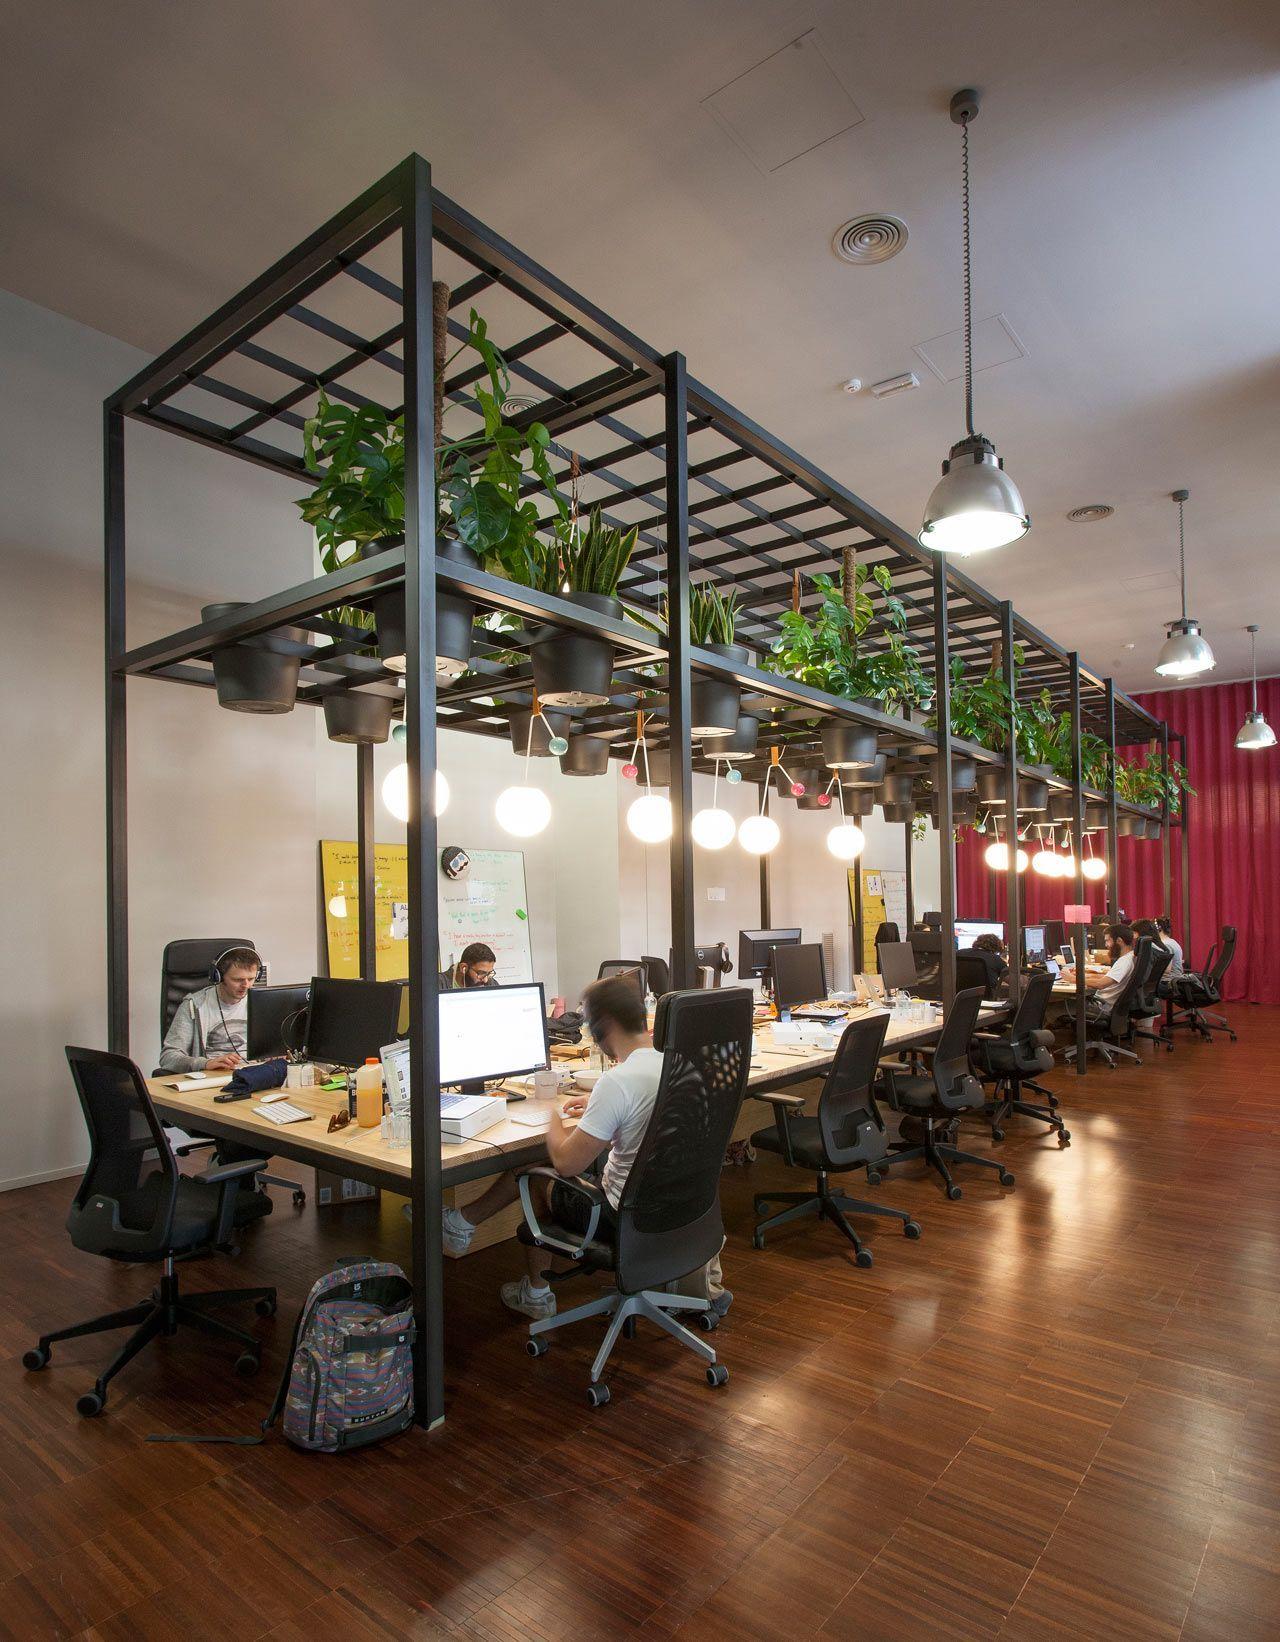 Typeform Office By Lagranja Design Office Design Pinterest